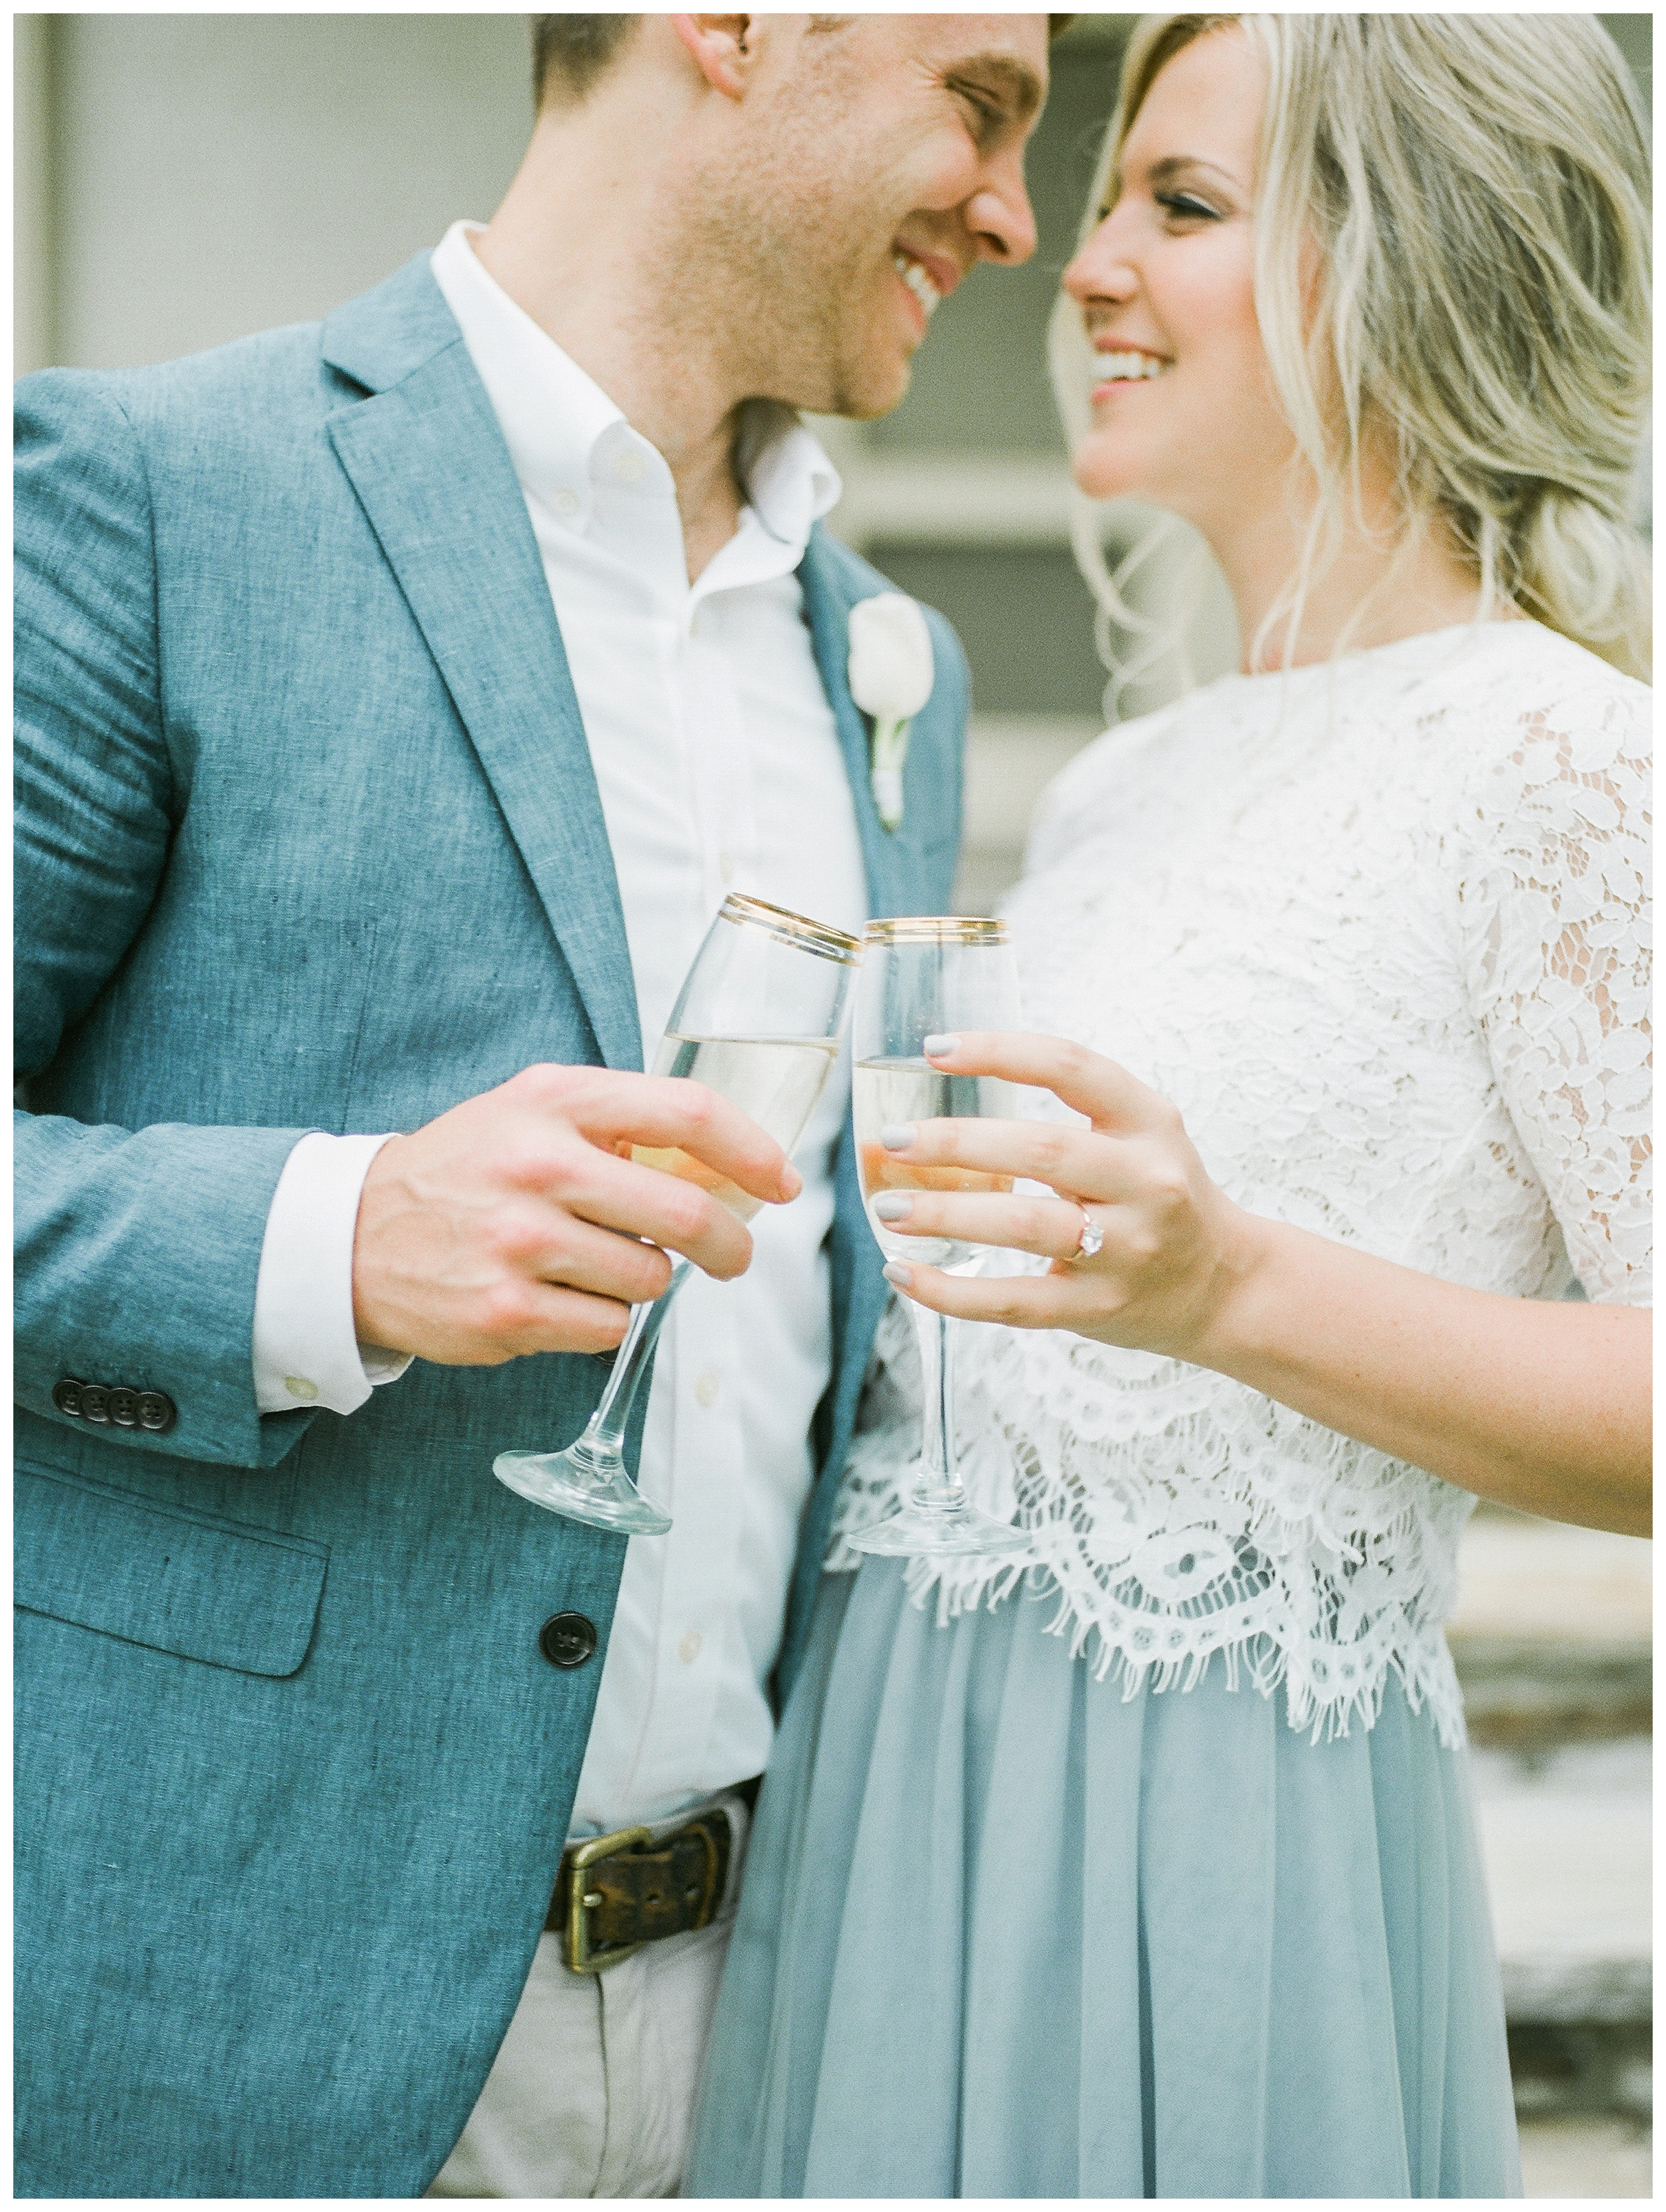 Rust Manor Wedding   Virginia Wedding Photographer Kir Tuben_0038.jpg